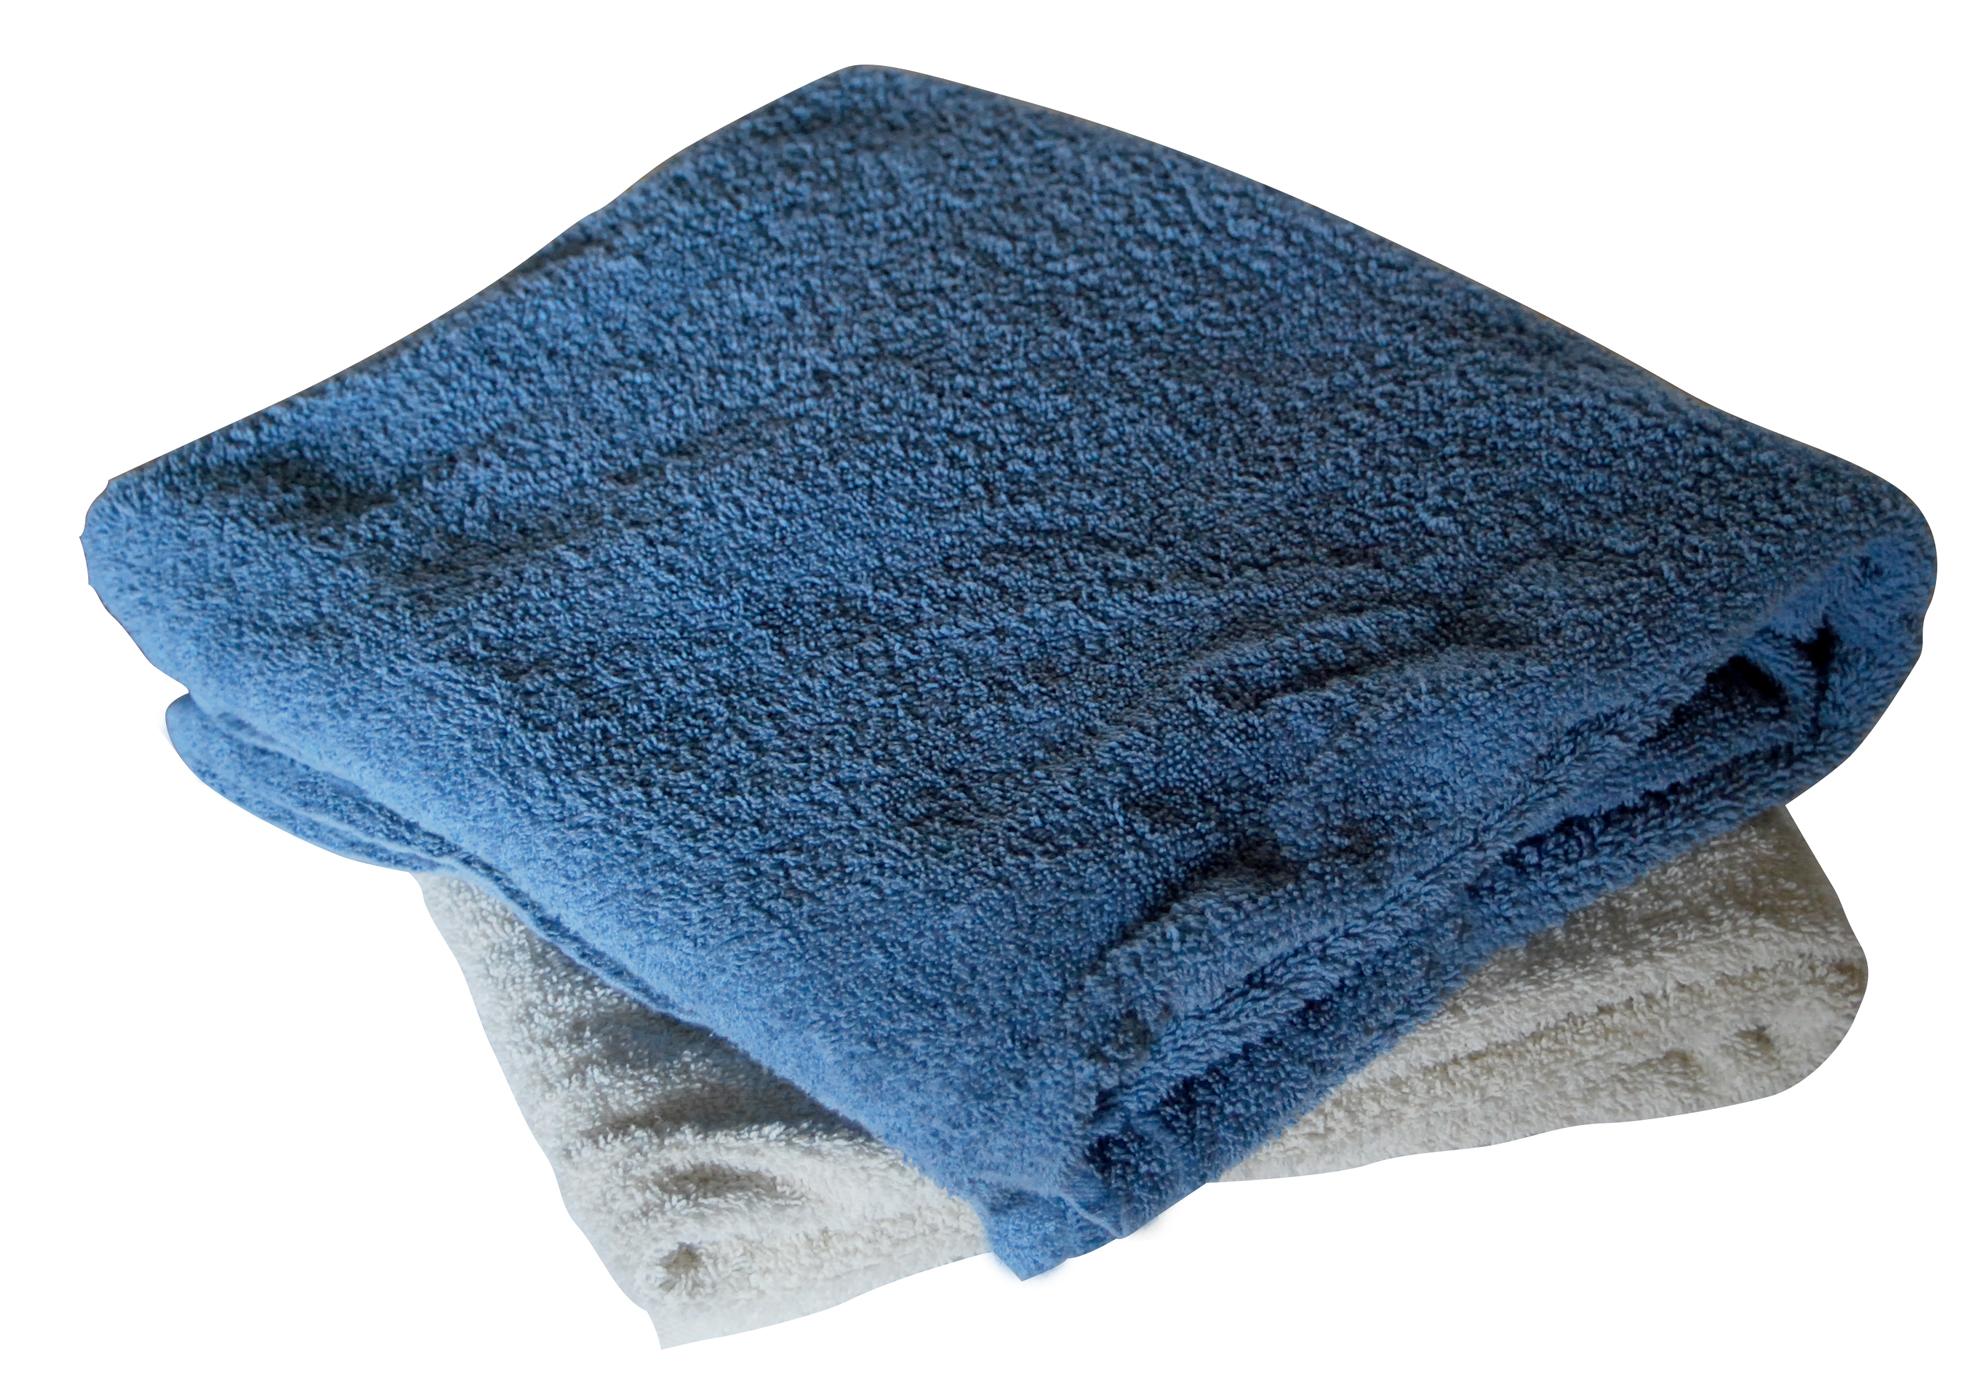 comfy-fuzzy-blankets.jpg